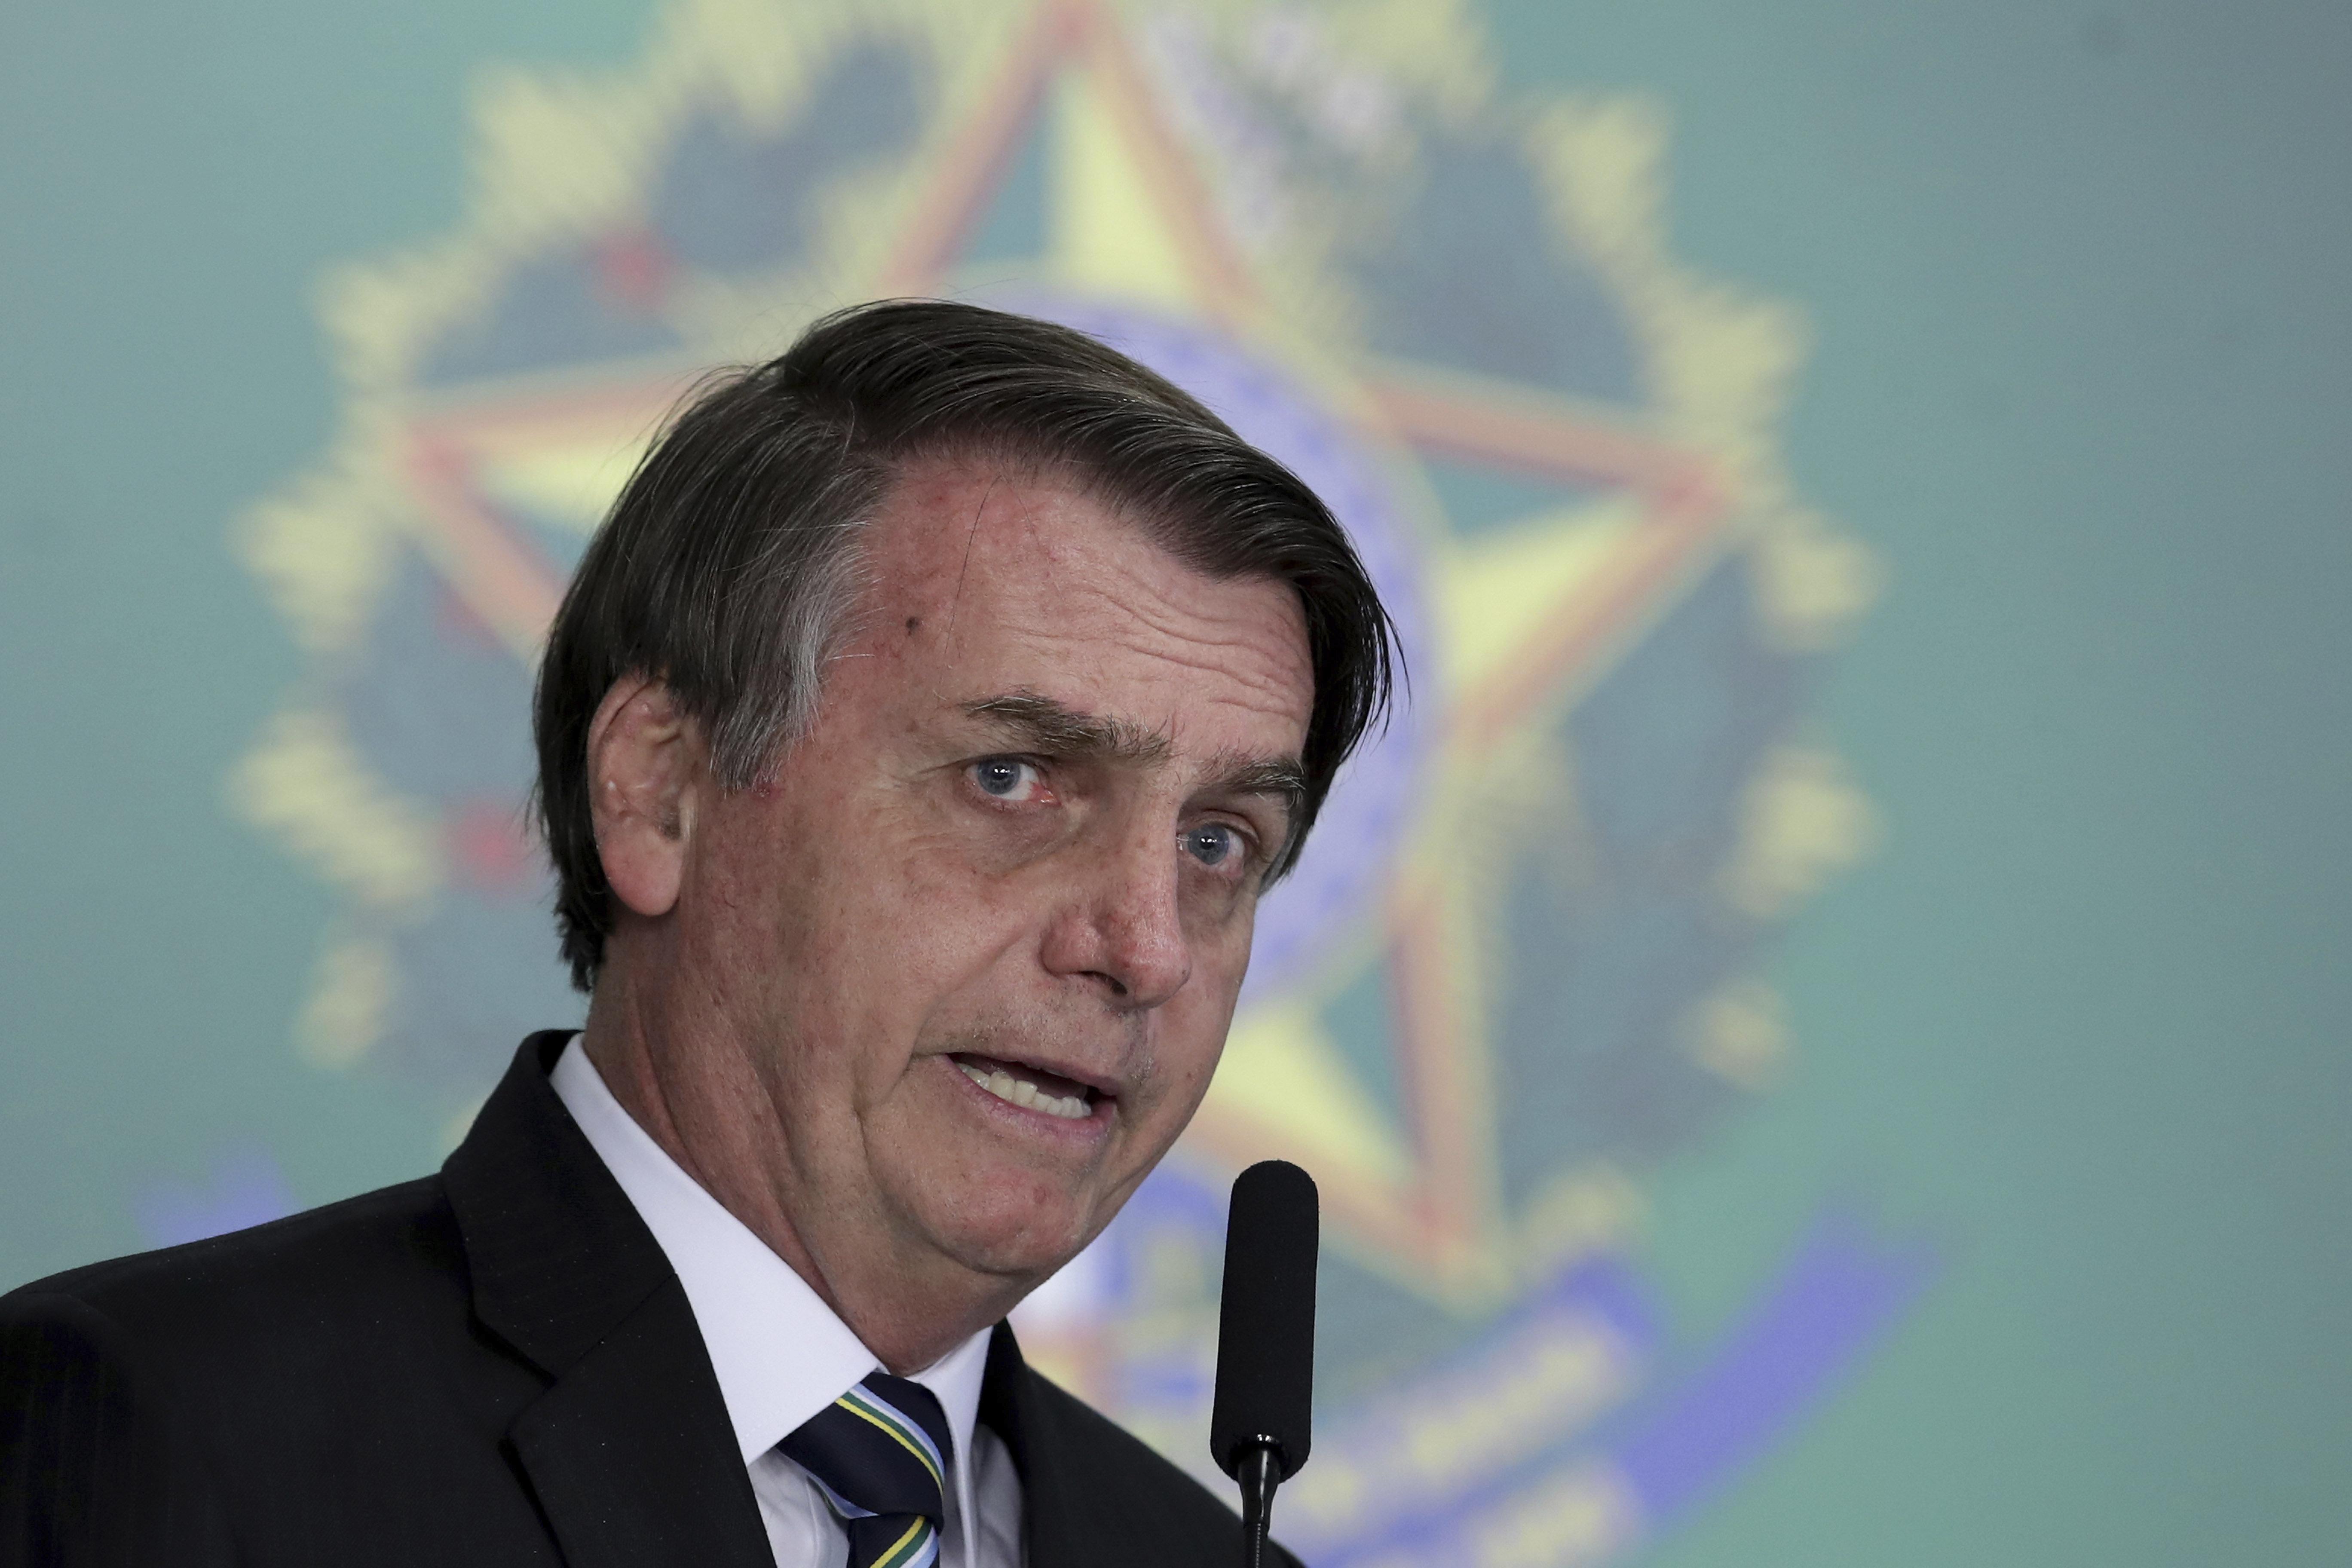 Rebuked By Israel, Brazil's Bolsonaro Clarifies Suggestion Holocaust Was Forgivable